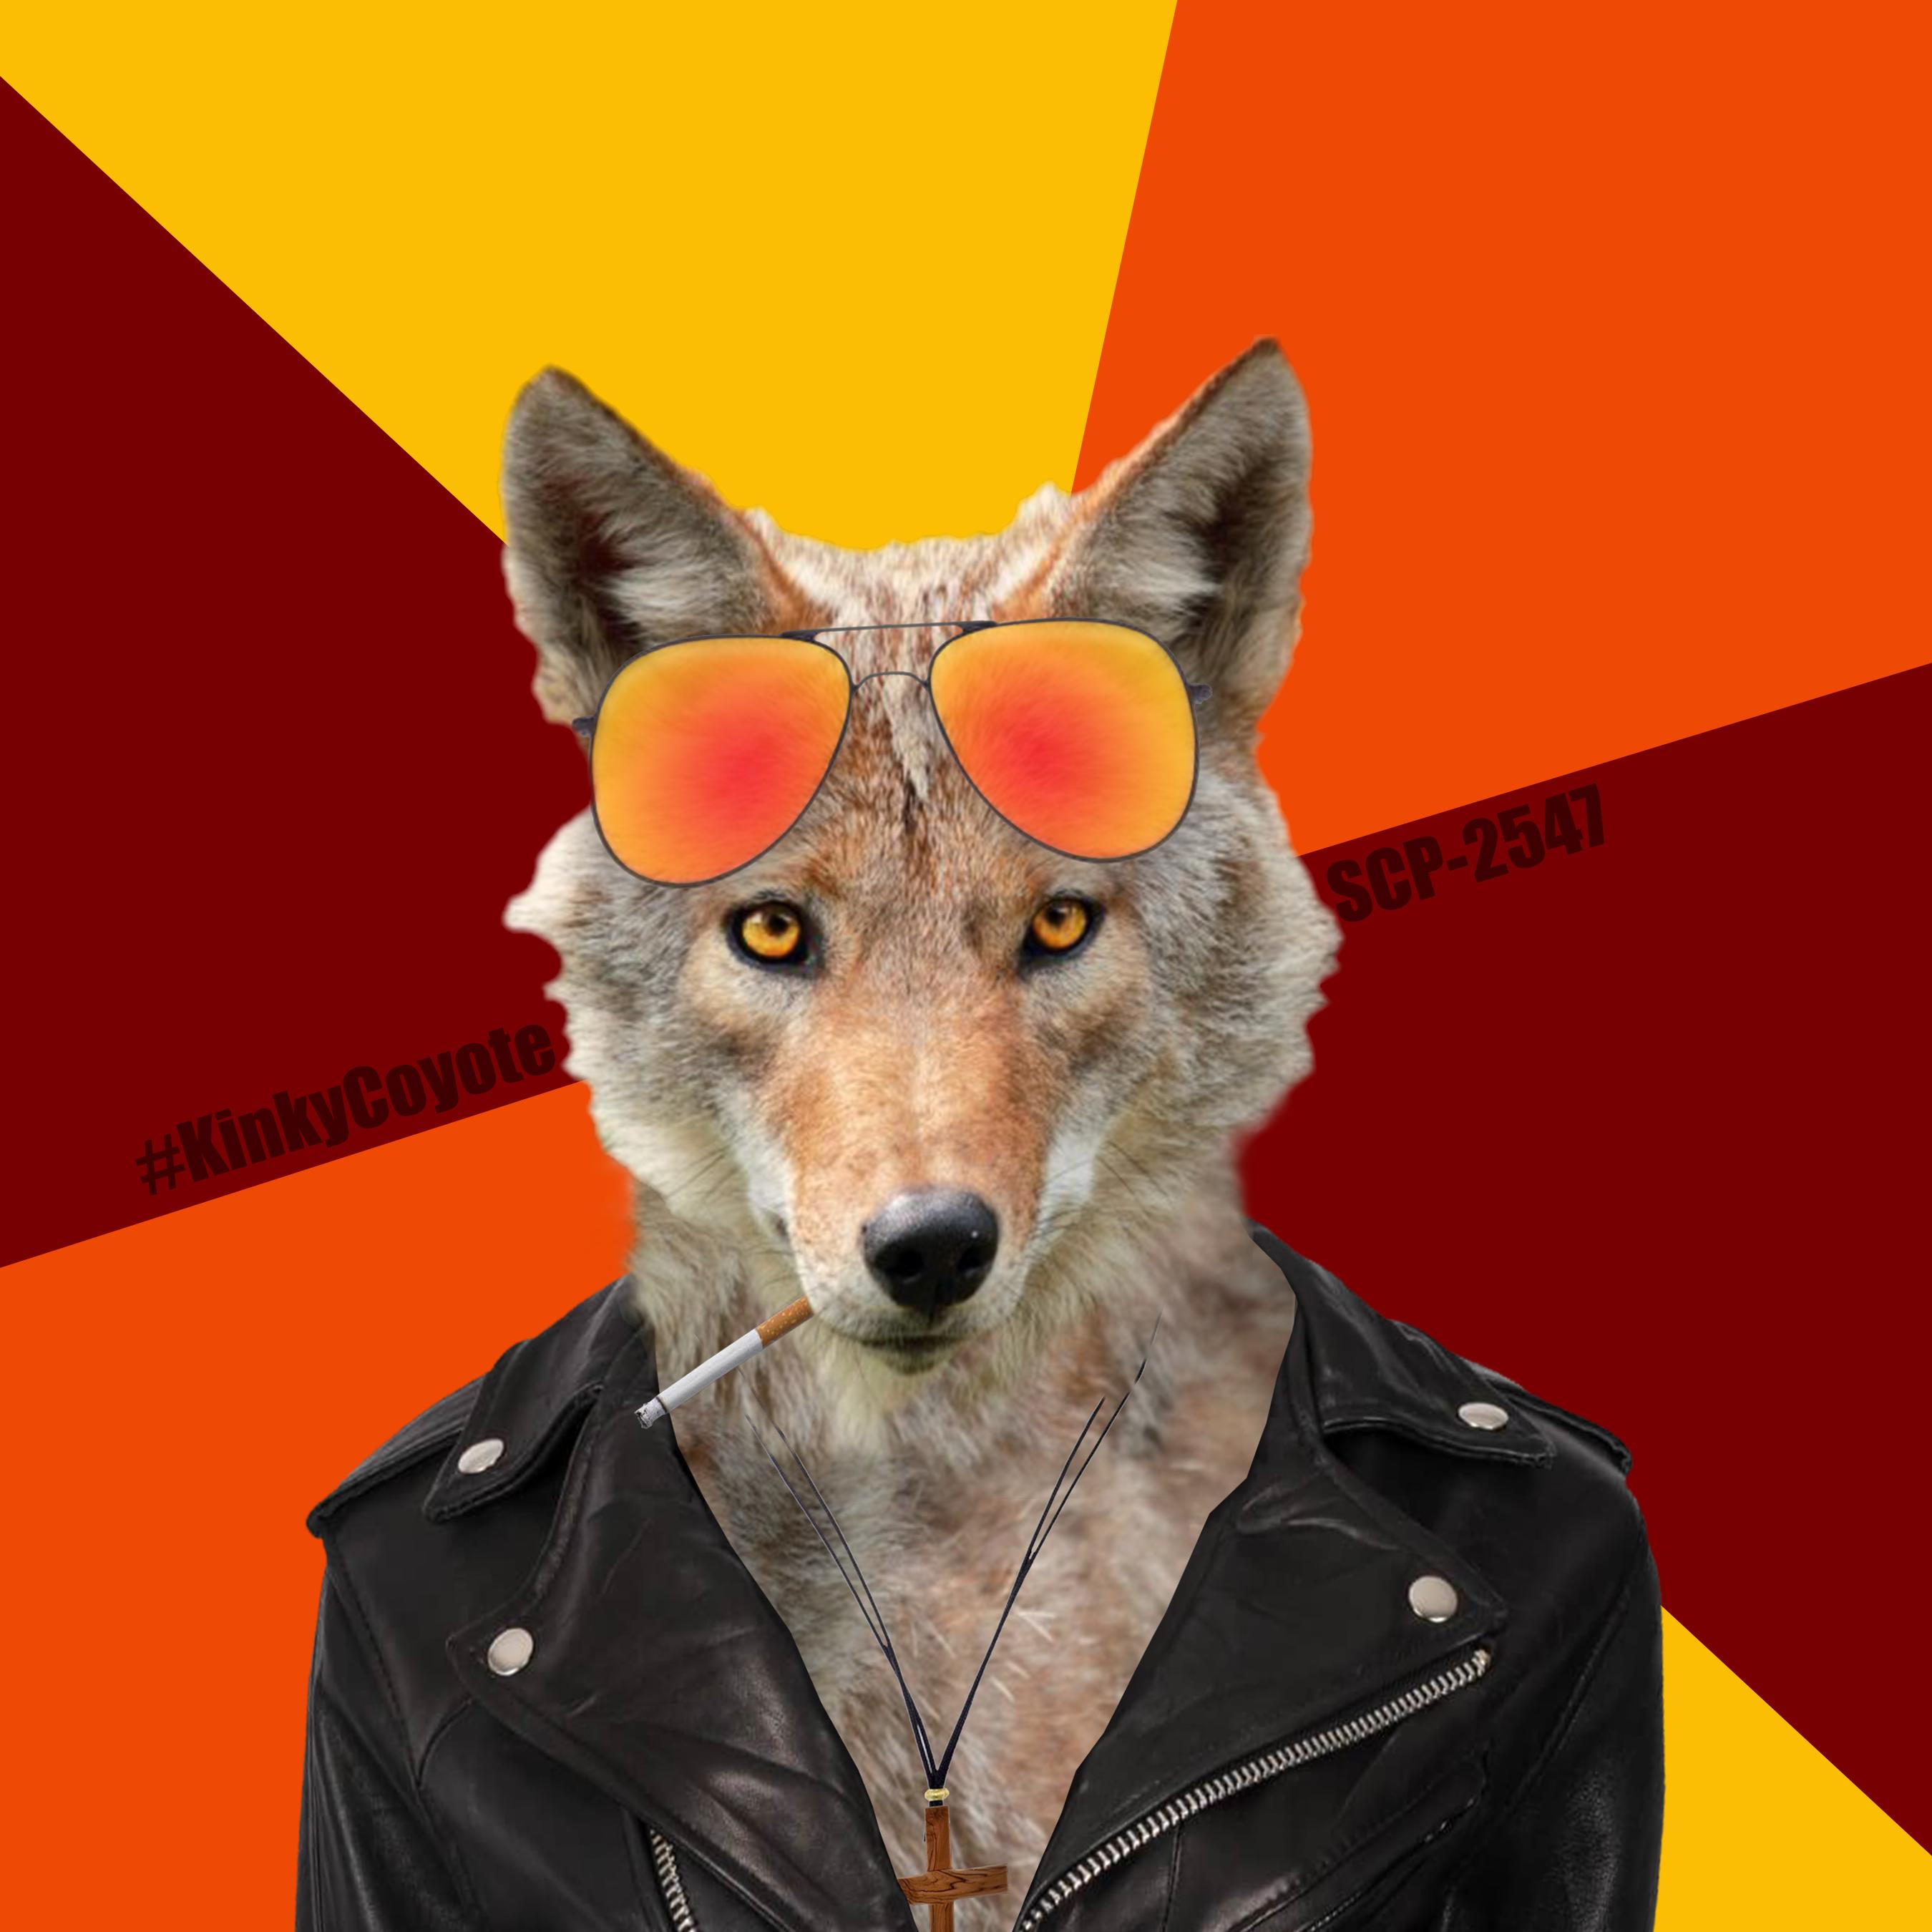 Kinky-Coyote_Meme_Blank02.png